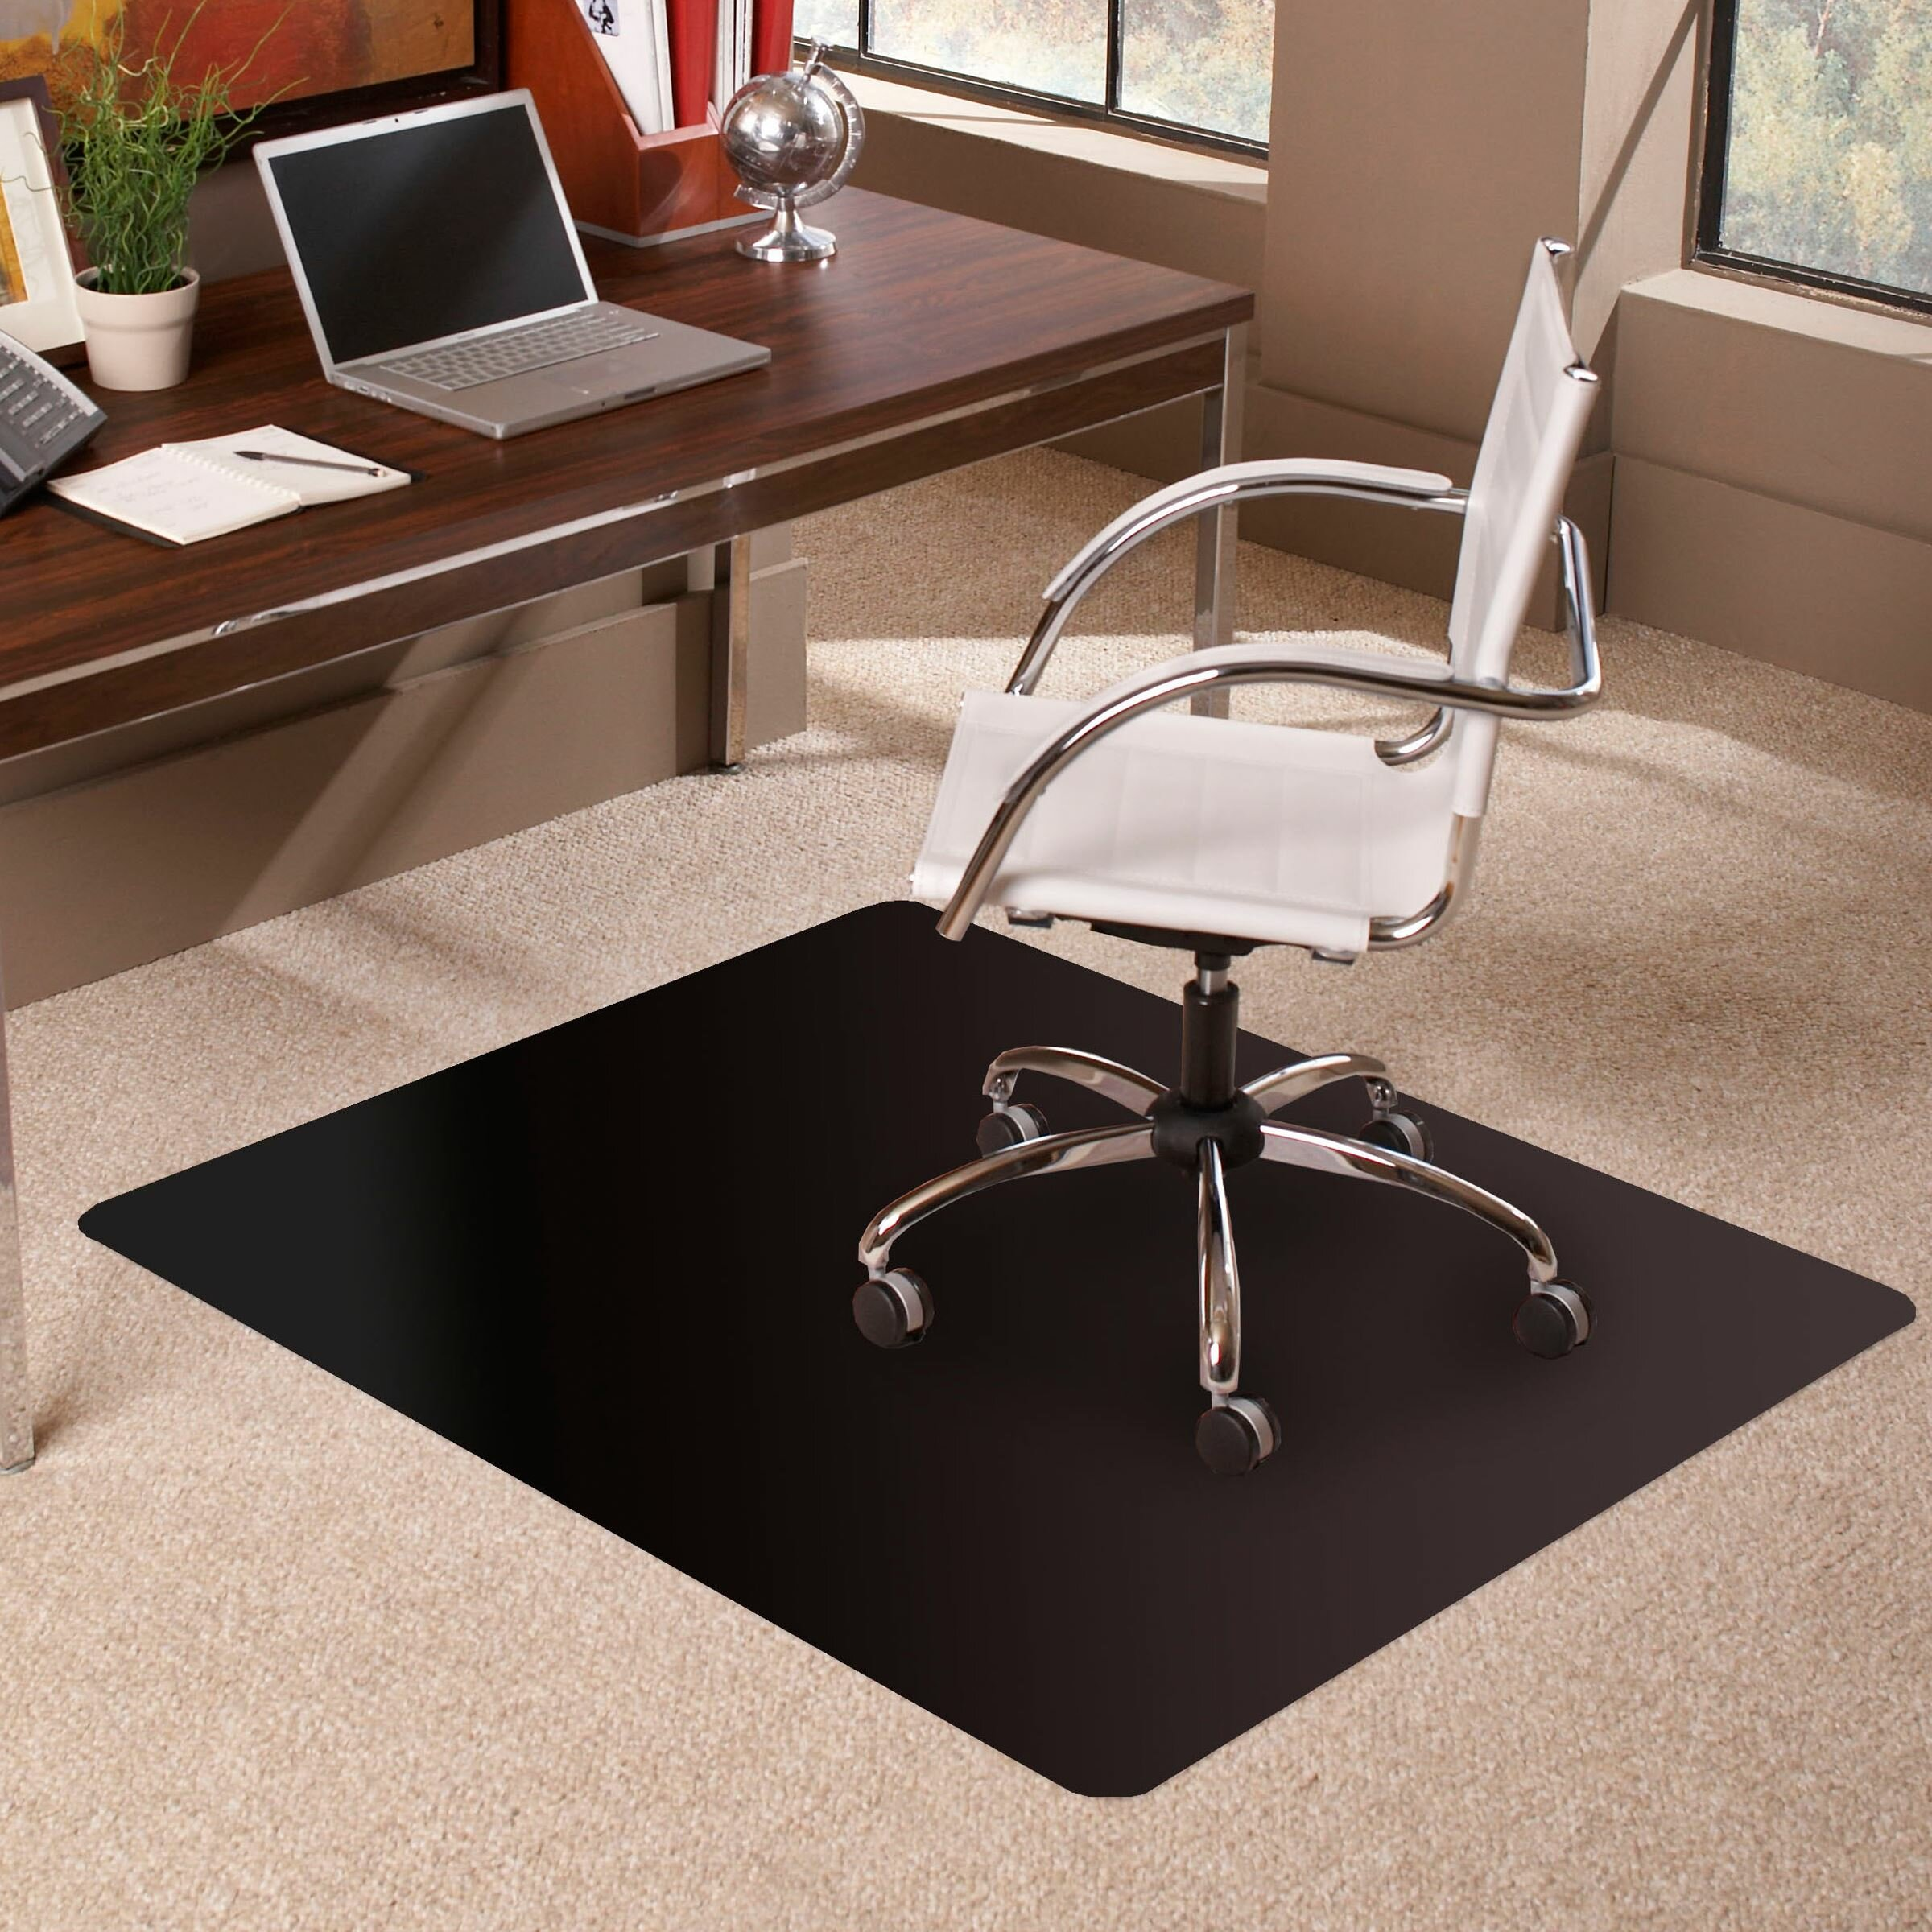 Chair Mat For Deep Pile Carpet: ES Robbins TrendSetter Rectangle Low Pile Carpet Straight